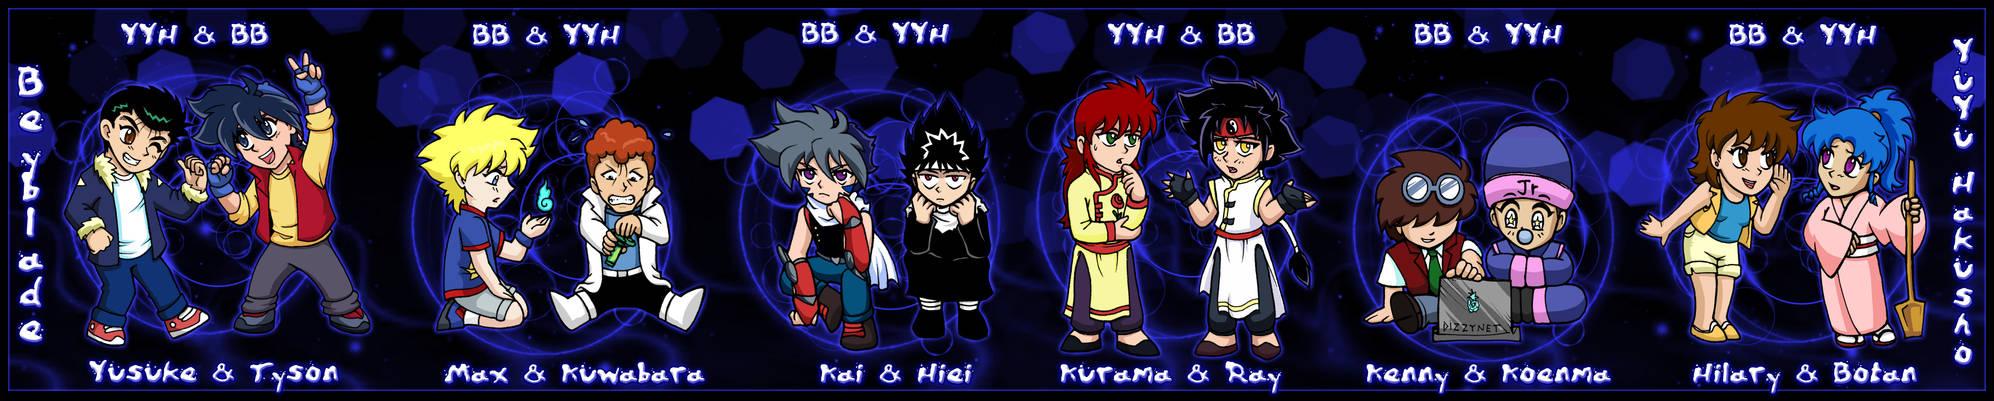 BB.:.YYH Chibi